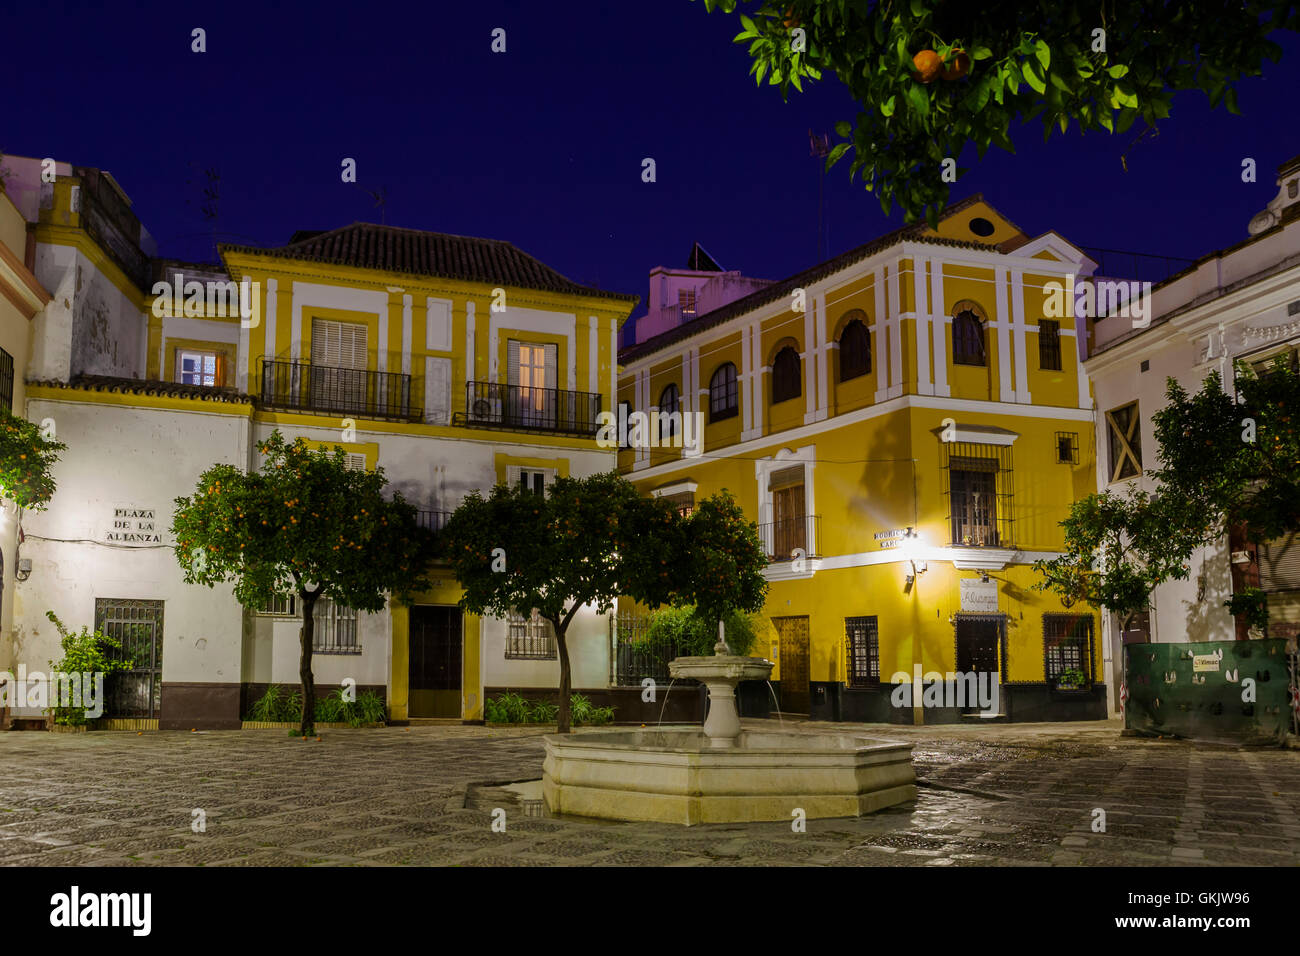 Fountain in the centre of a deserted Plaza de la Alianza, Barrio de Santa Cruz, Sevilla, Andalucía, Spain, - Stock Image